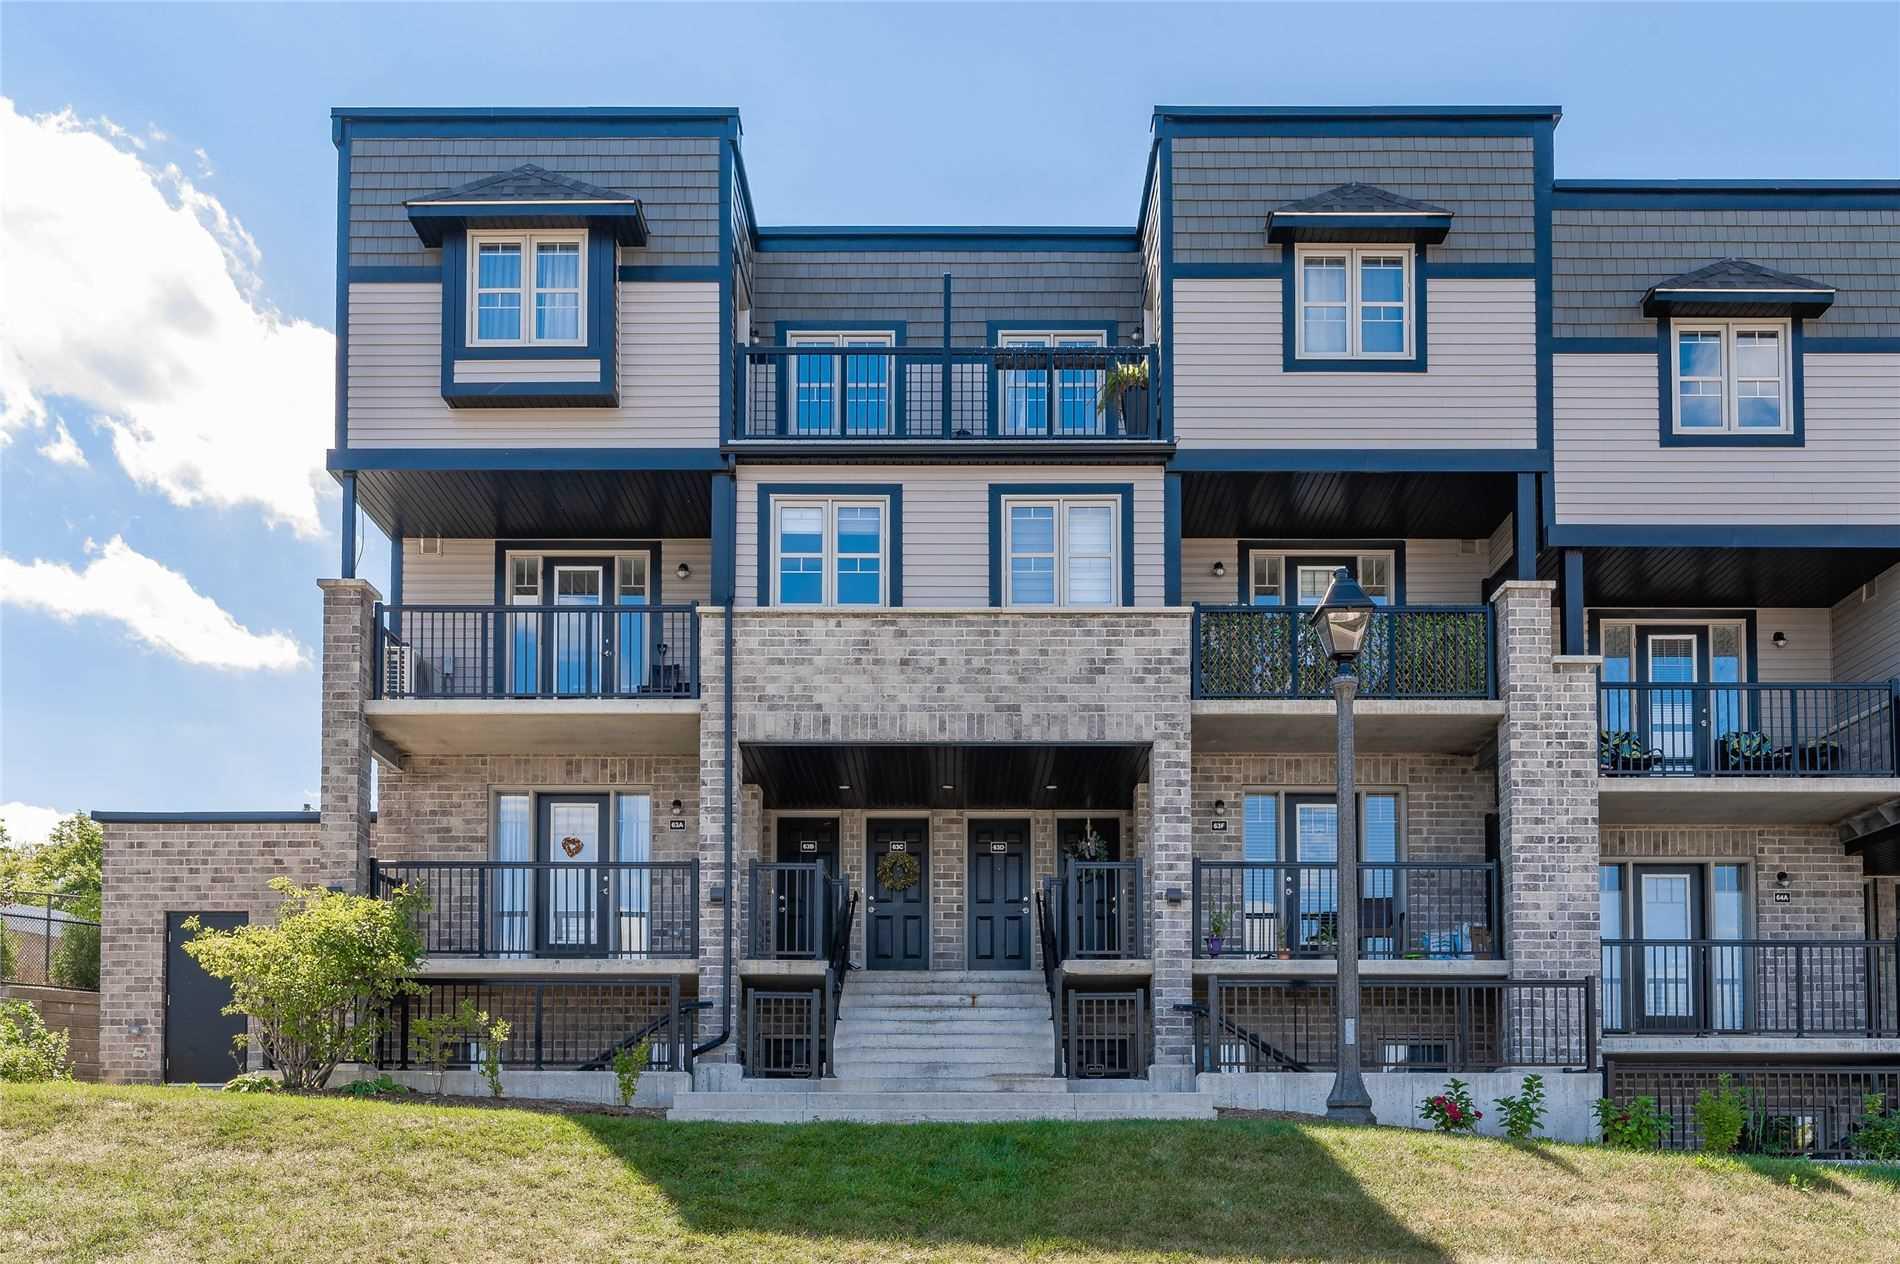 1989 Ottawa St, Kitchener, Ontario N2E 0G7, 2 Bedrooms Bedrooms, ,2 BathroomsBathrooms,Condo Townhouse,For Sale,Ottawa,X5374023